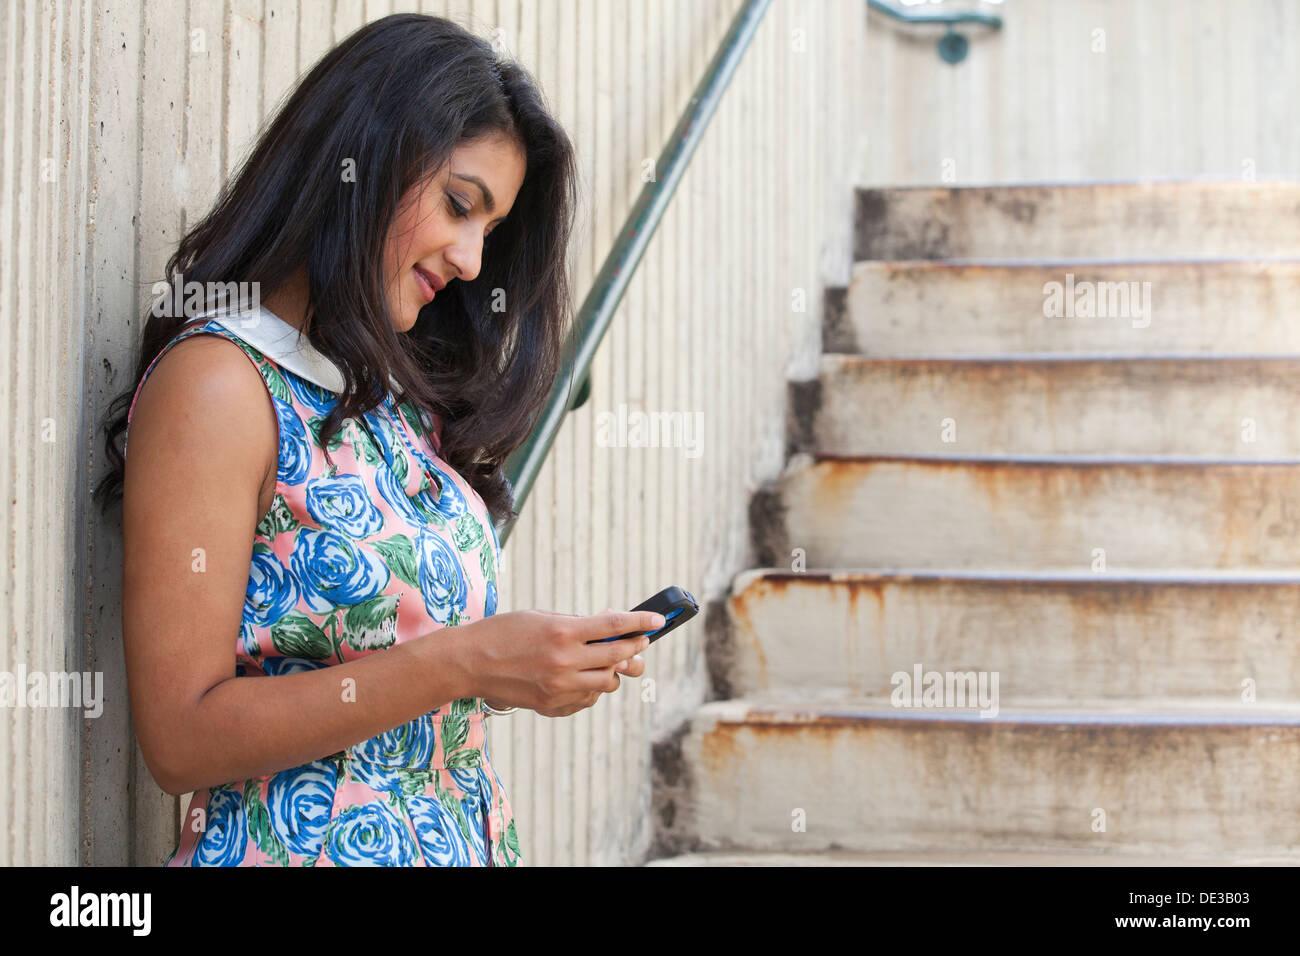 Mujer mirando su teléfono celular Foto de stock